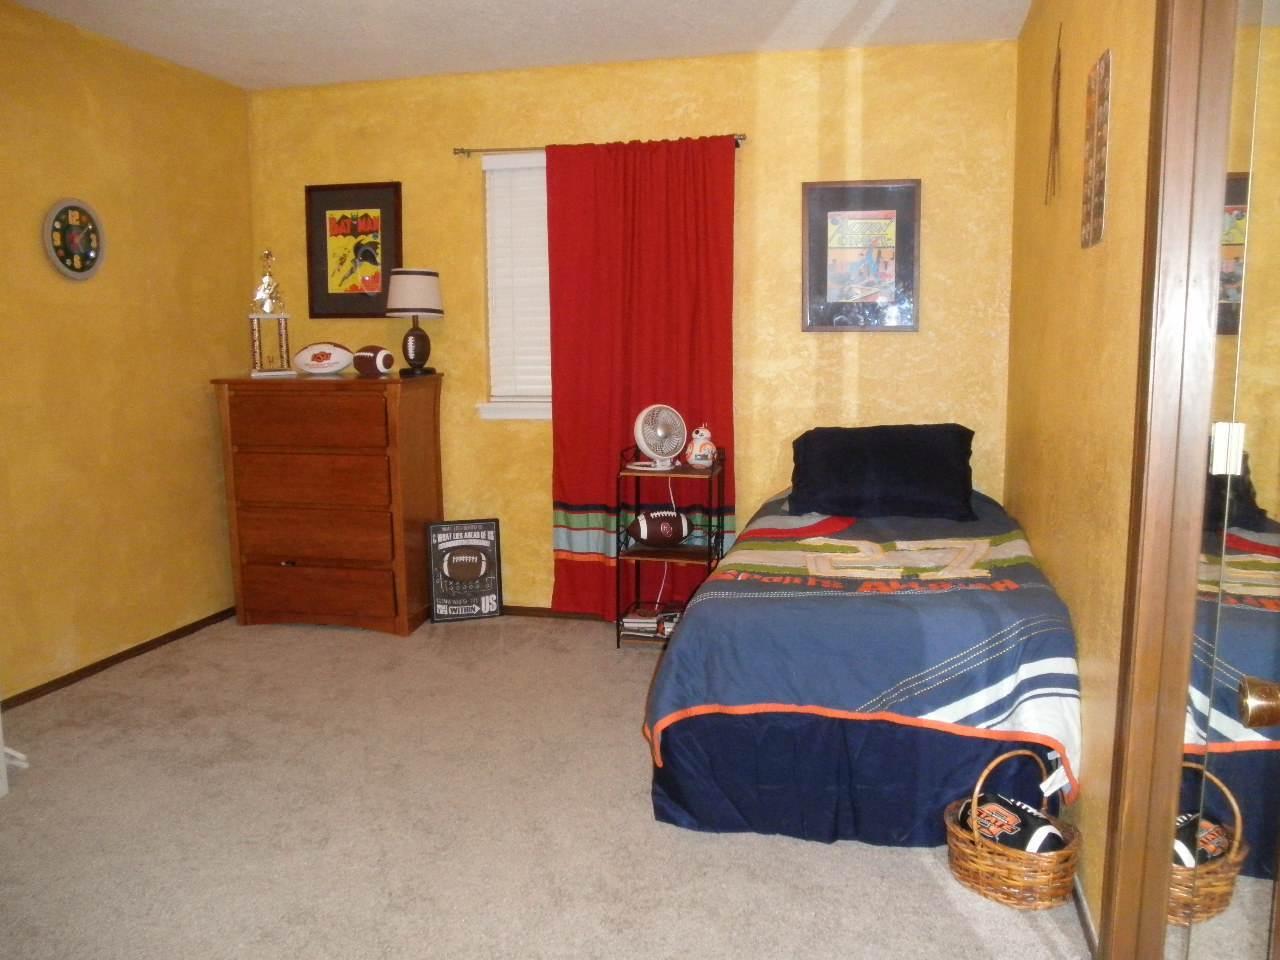 Sold Cross Sale W/ MLS | 2805 Ames  Ponca City, OK  19